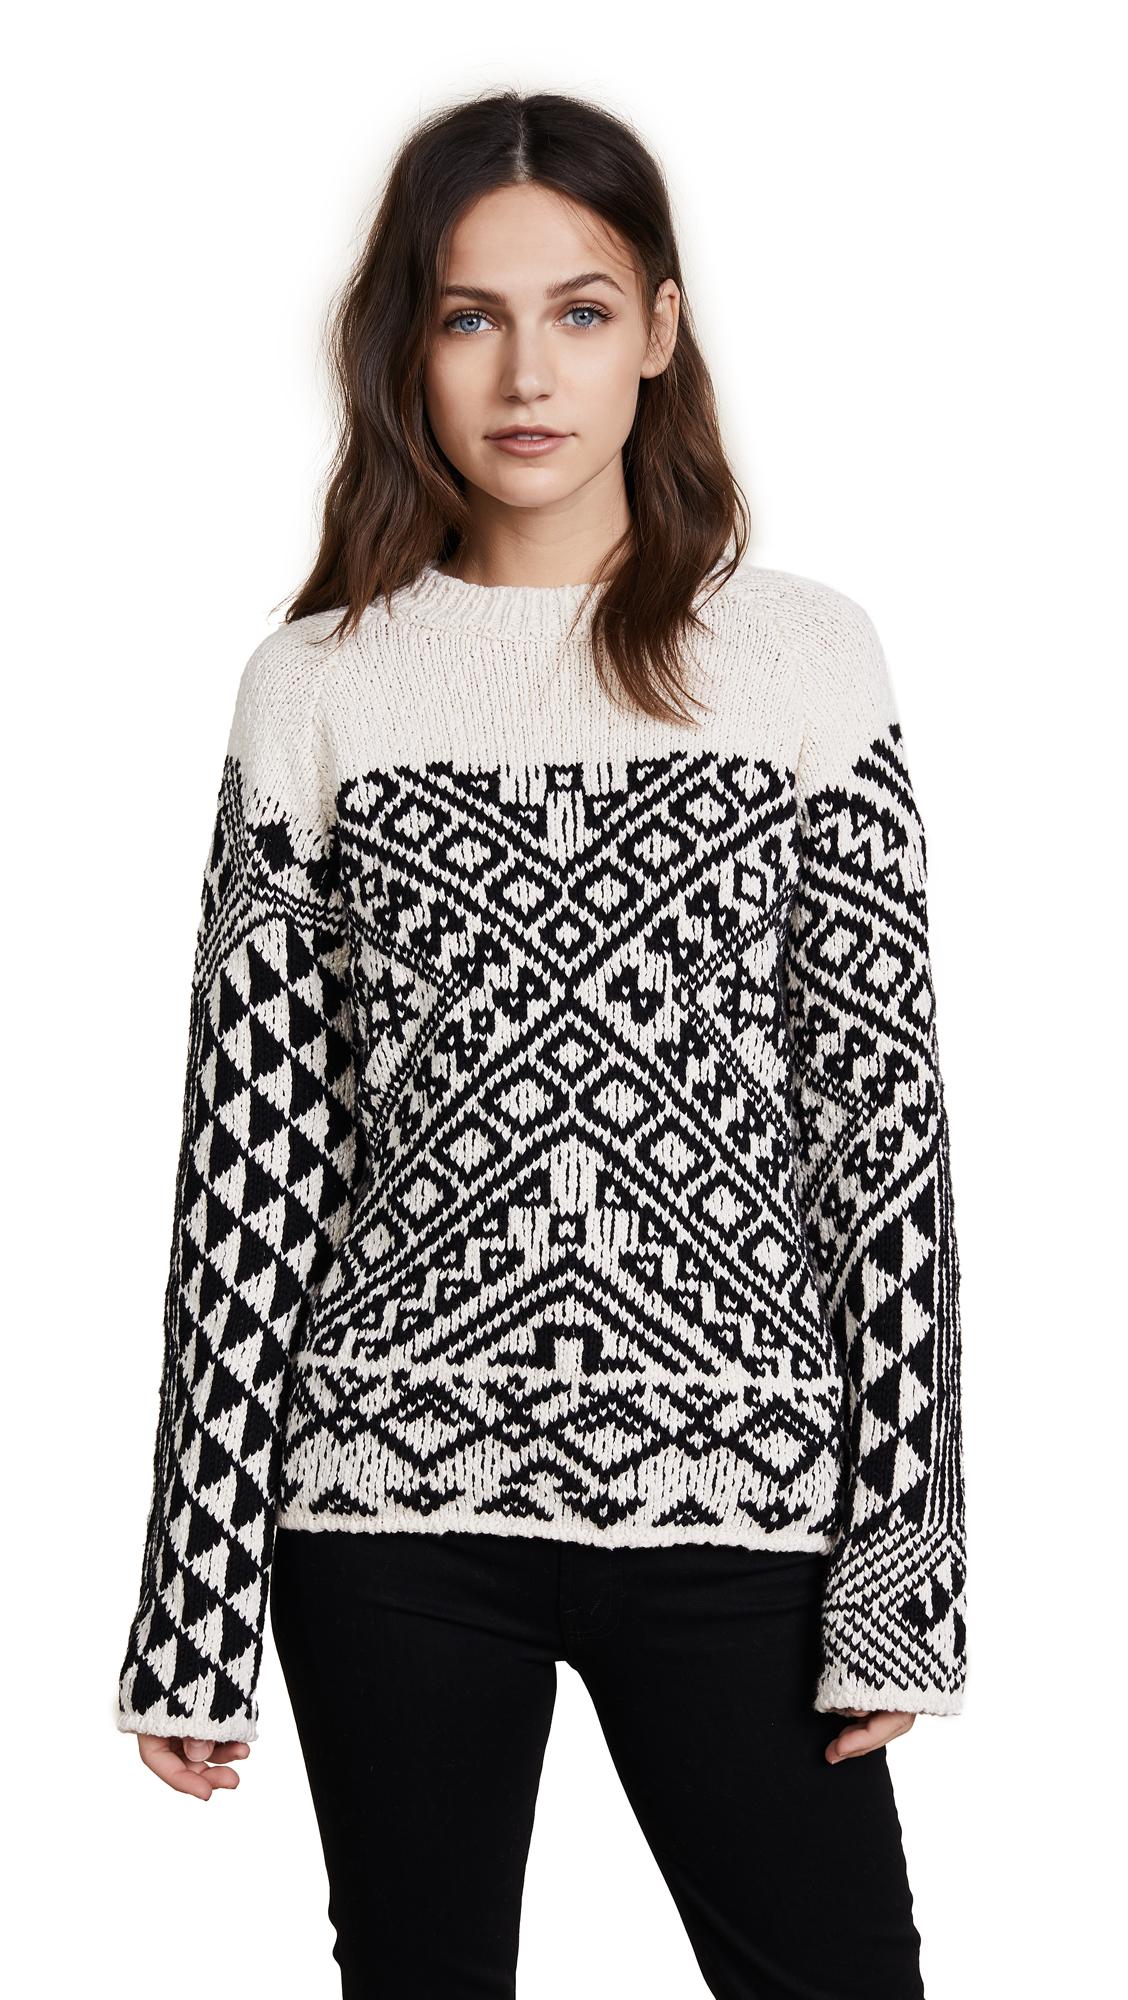 Acne Studios Rhia Sweater - Off White/Black